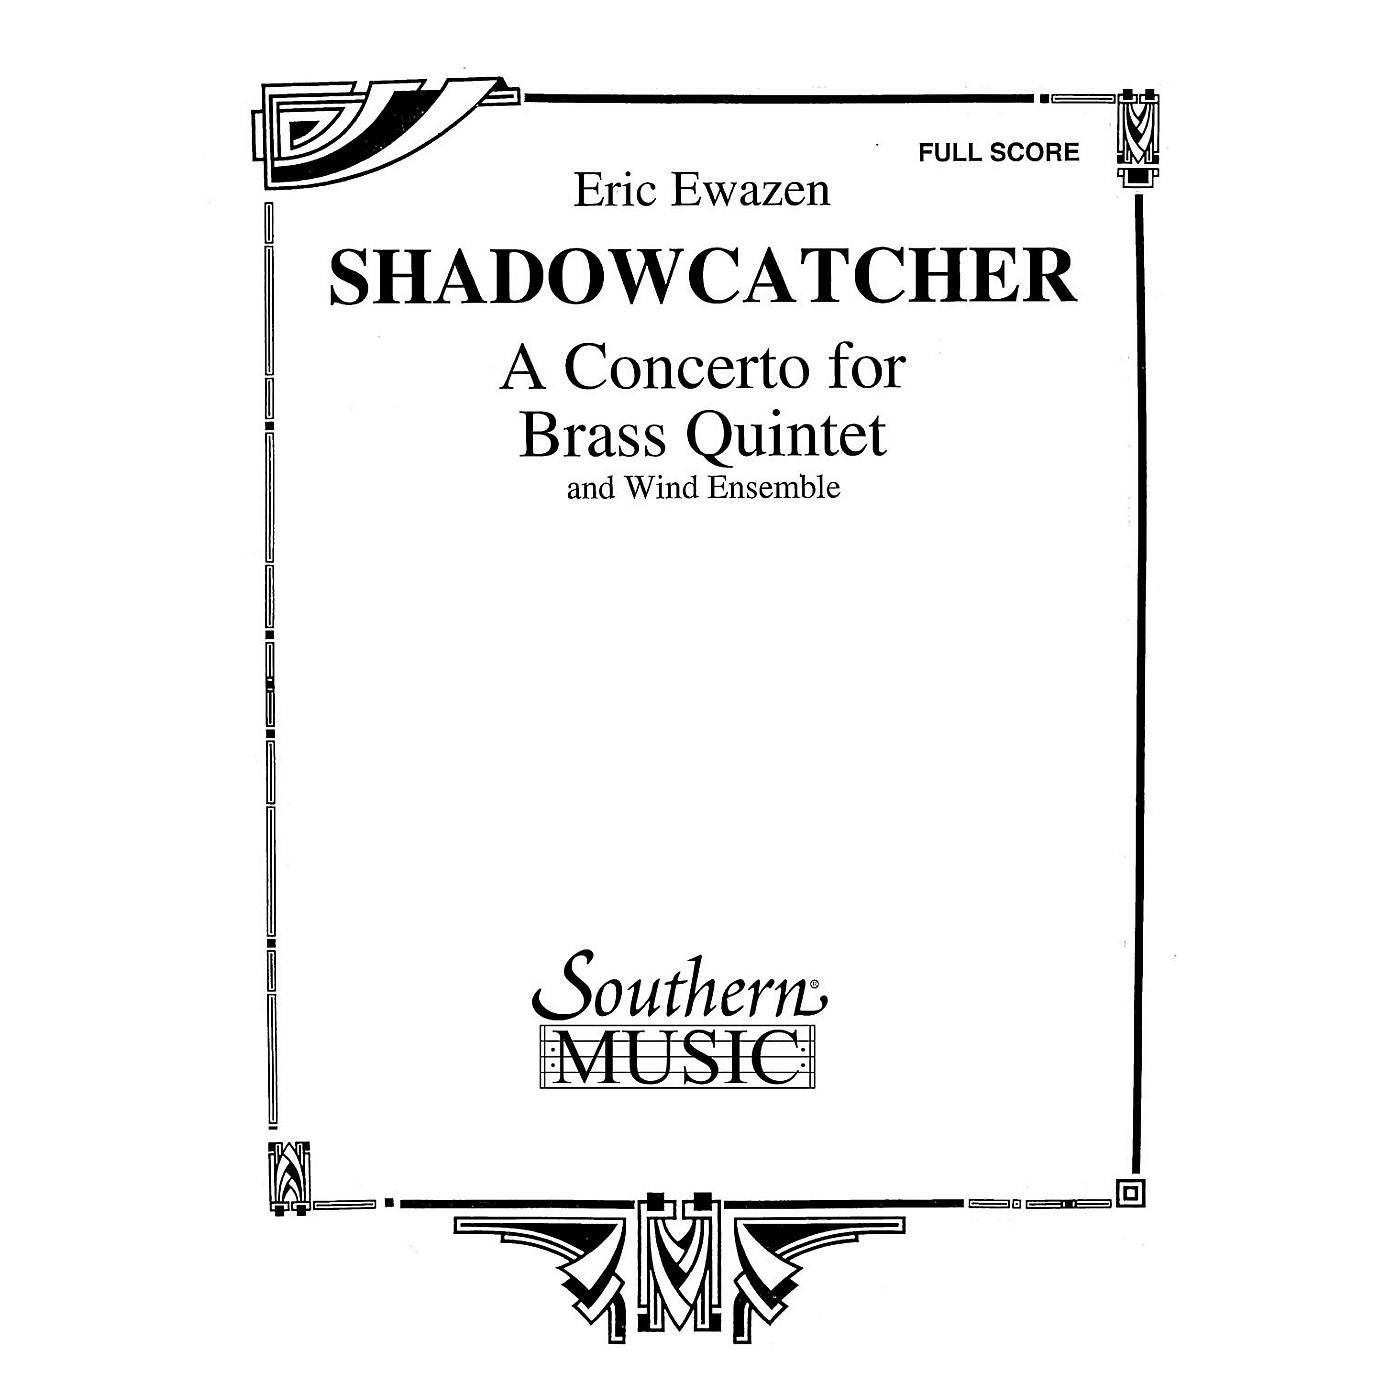 Southern Shadowcatcher (Brass Quintet and Wind Ensemble Oversized Full Score) Concert Band Level 4 by Eric Ewazen thumbnail